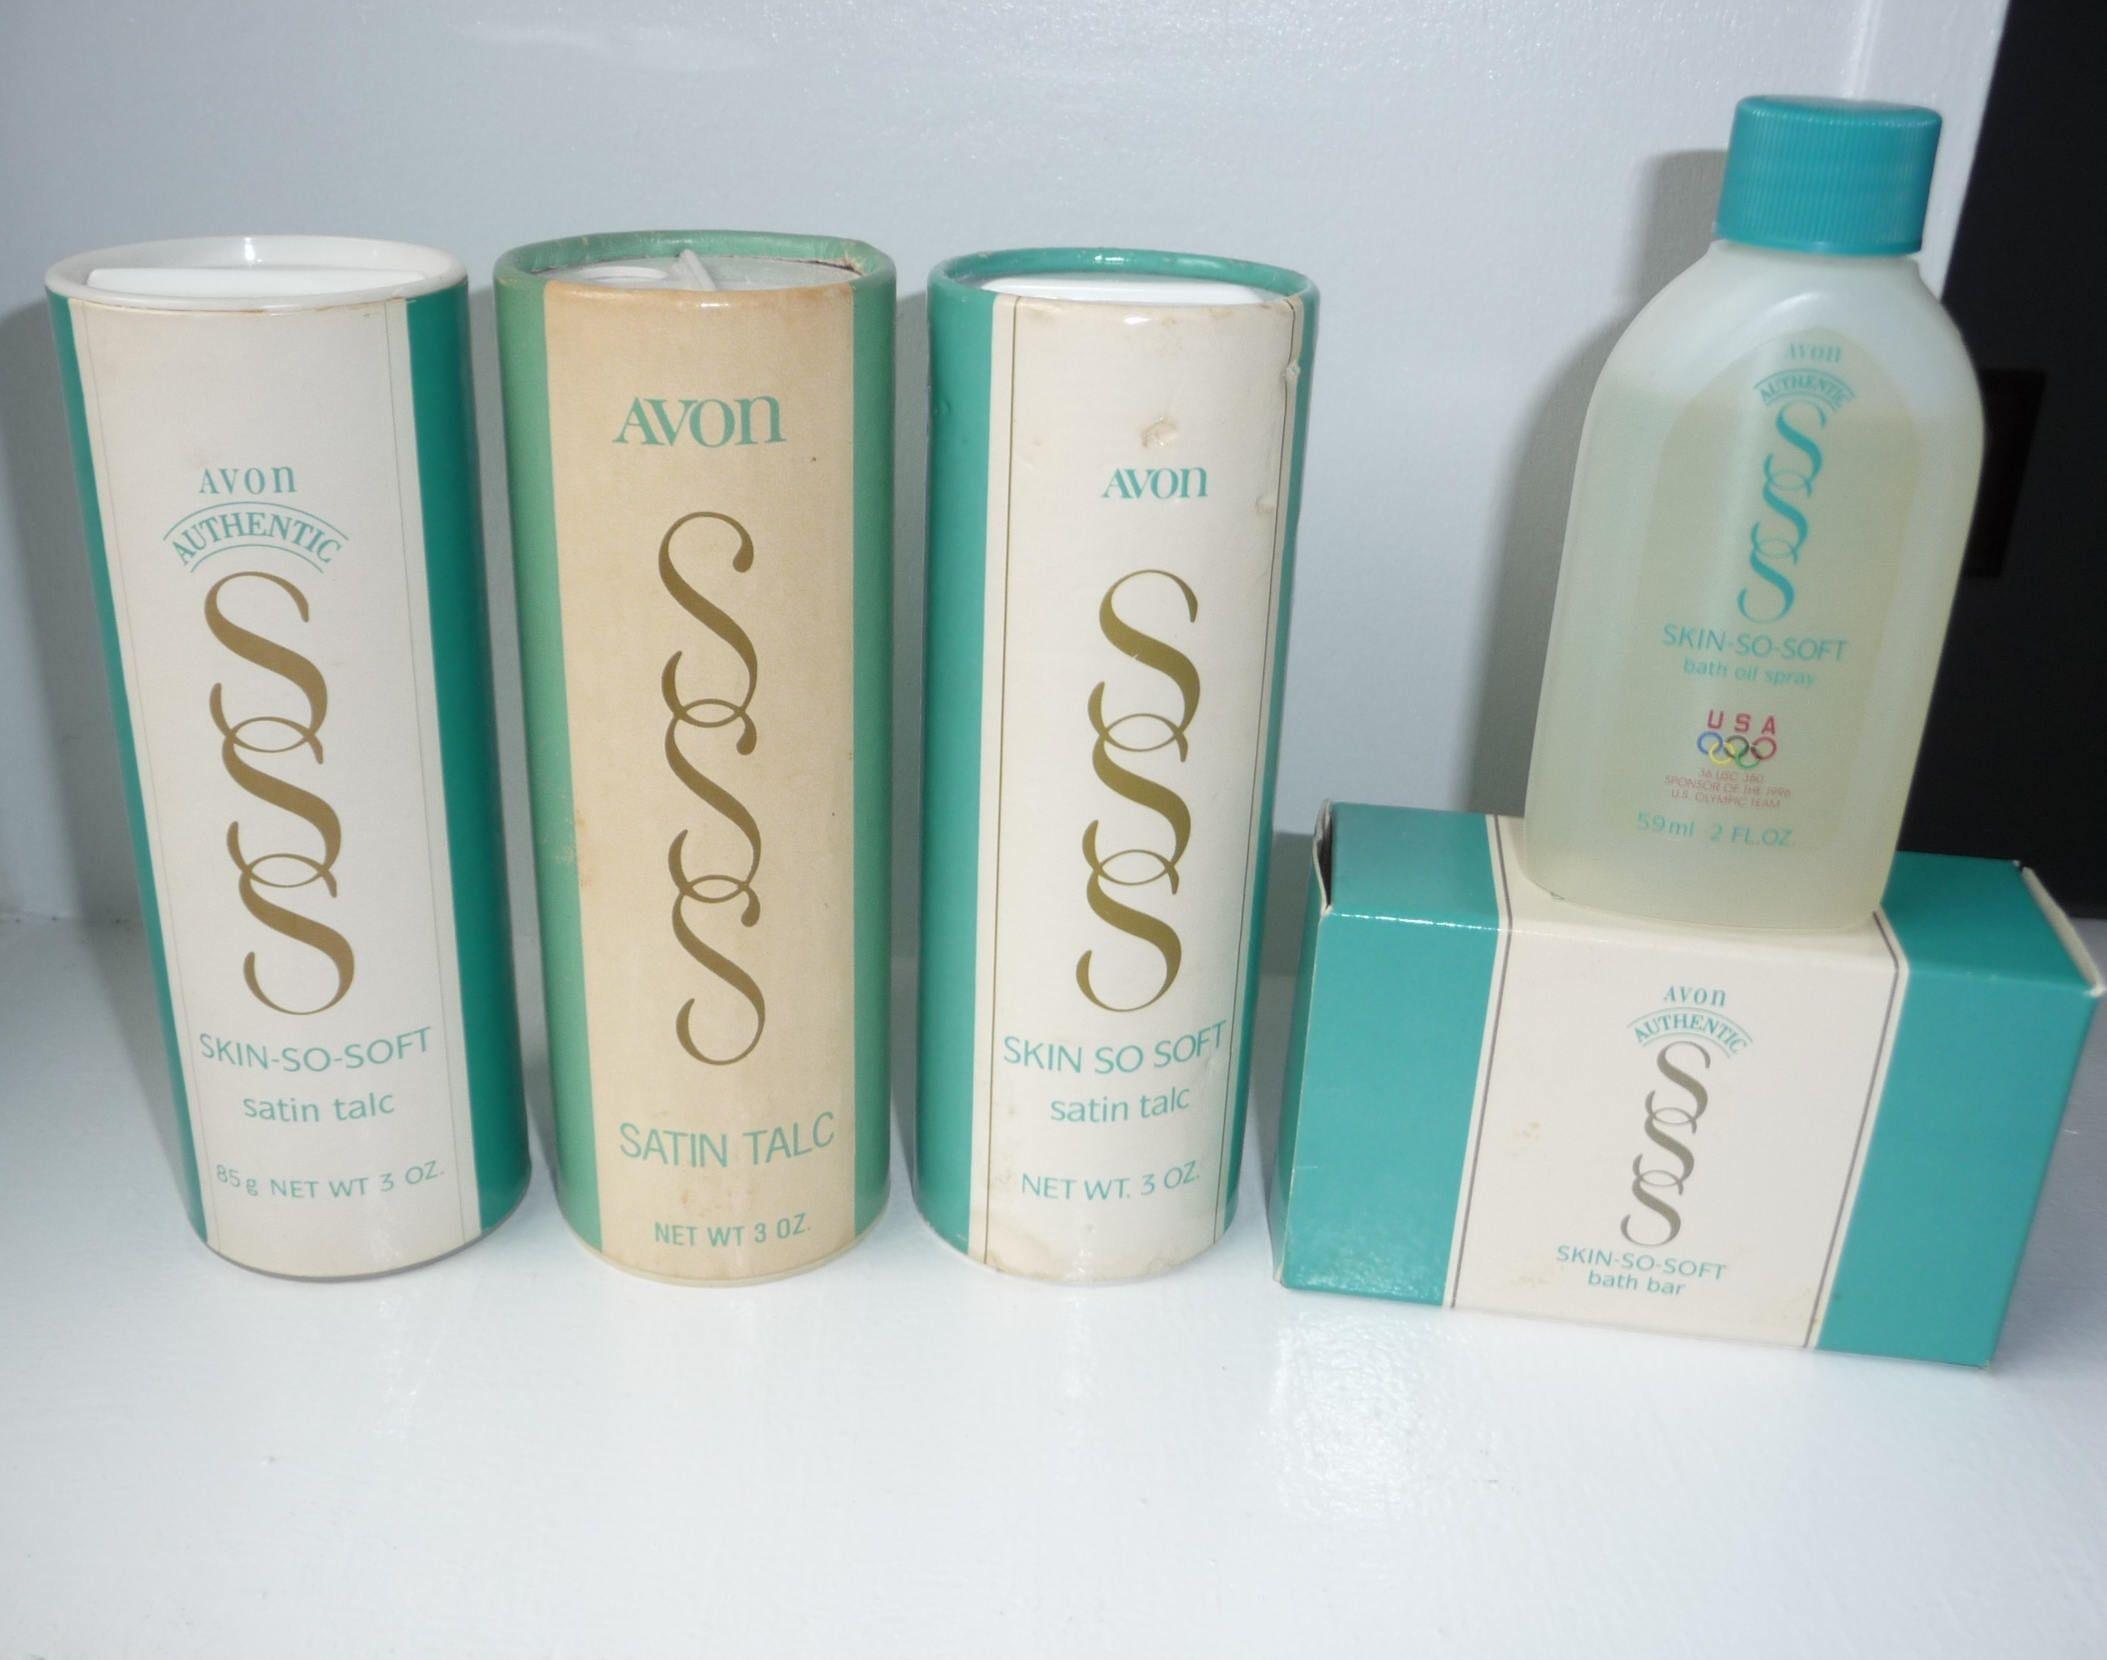 AVON Skin-So-Soft Classic Bathoil Empty